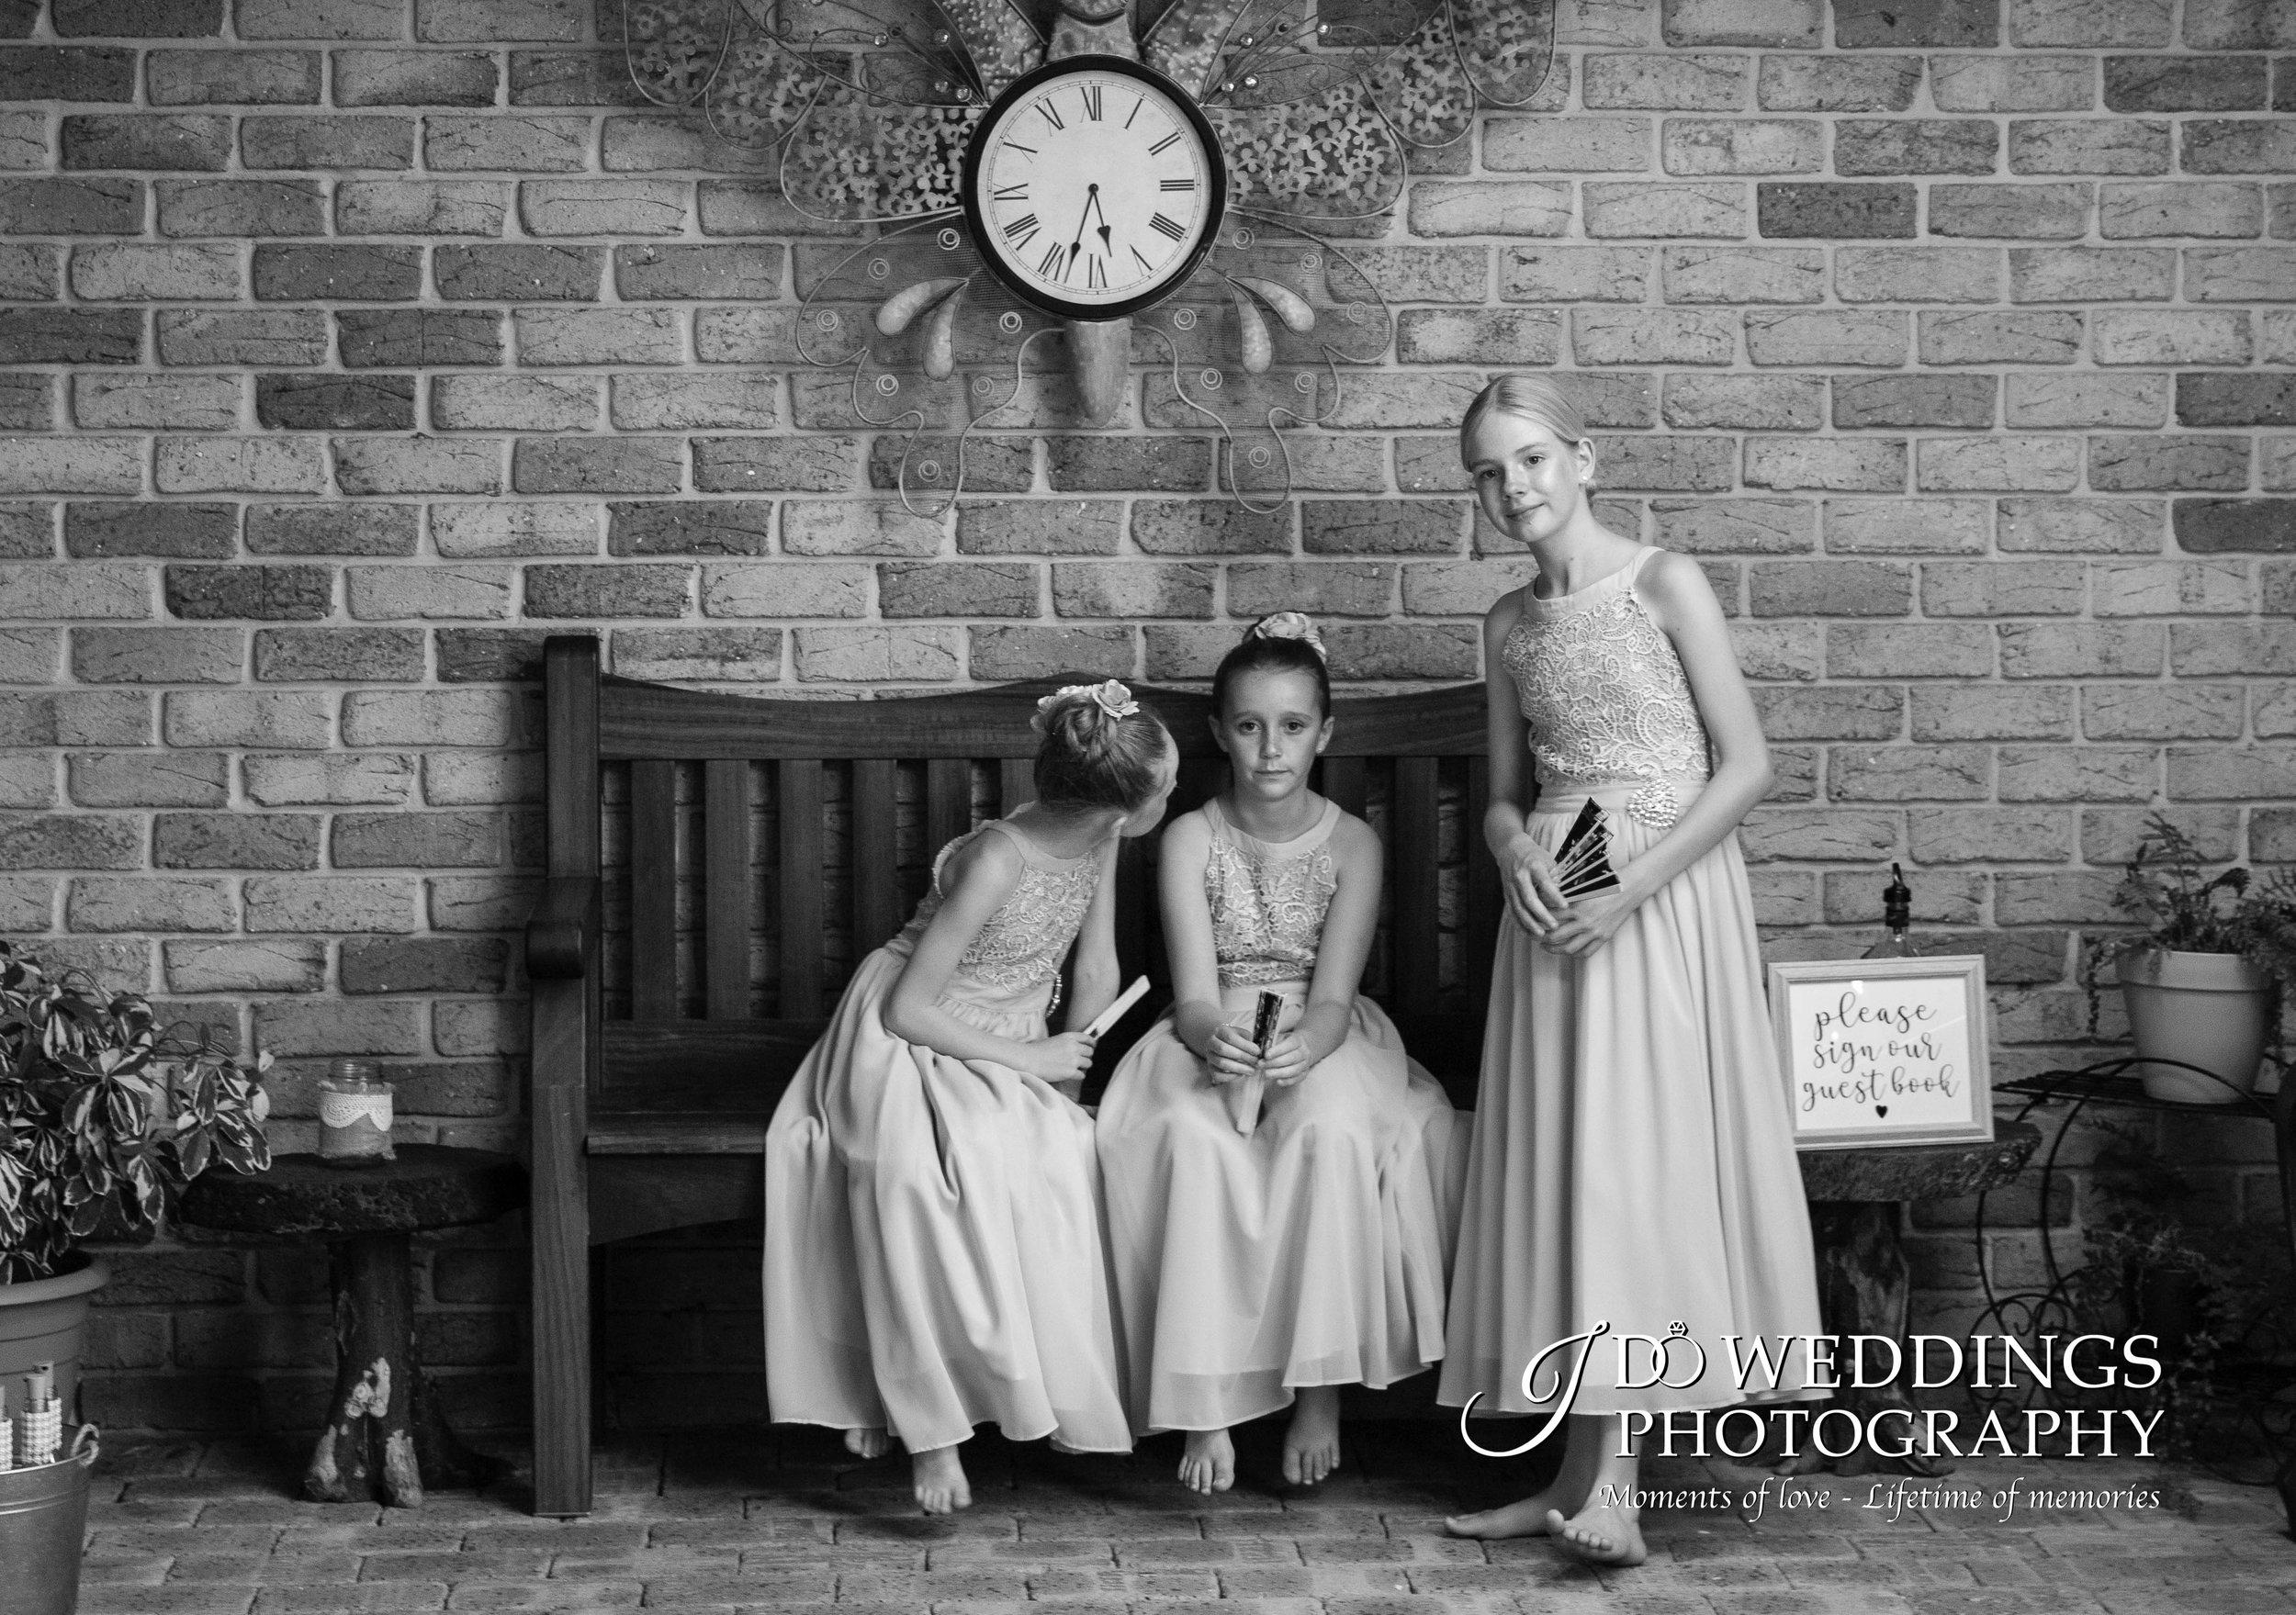 wedding images15.jpg